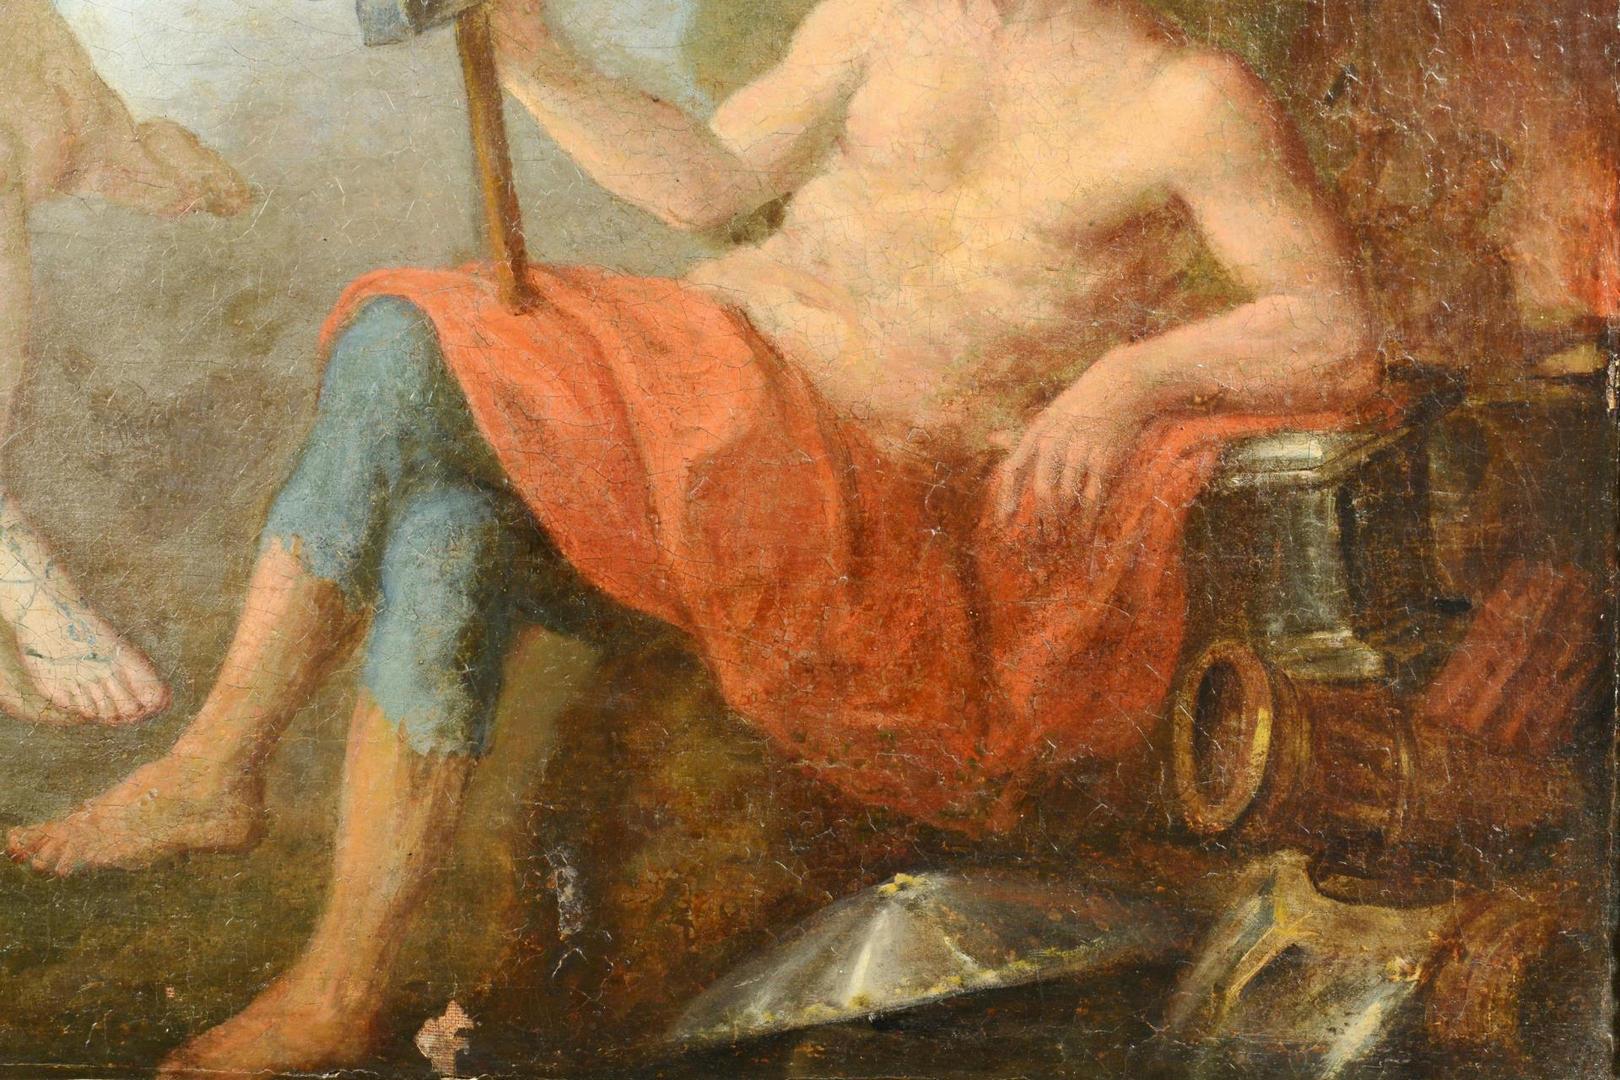 Lot 672: French School 18th c., Venus & Vulcan mythological